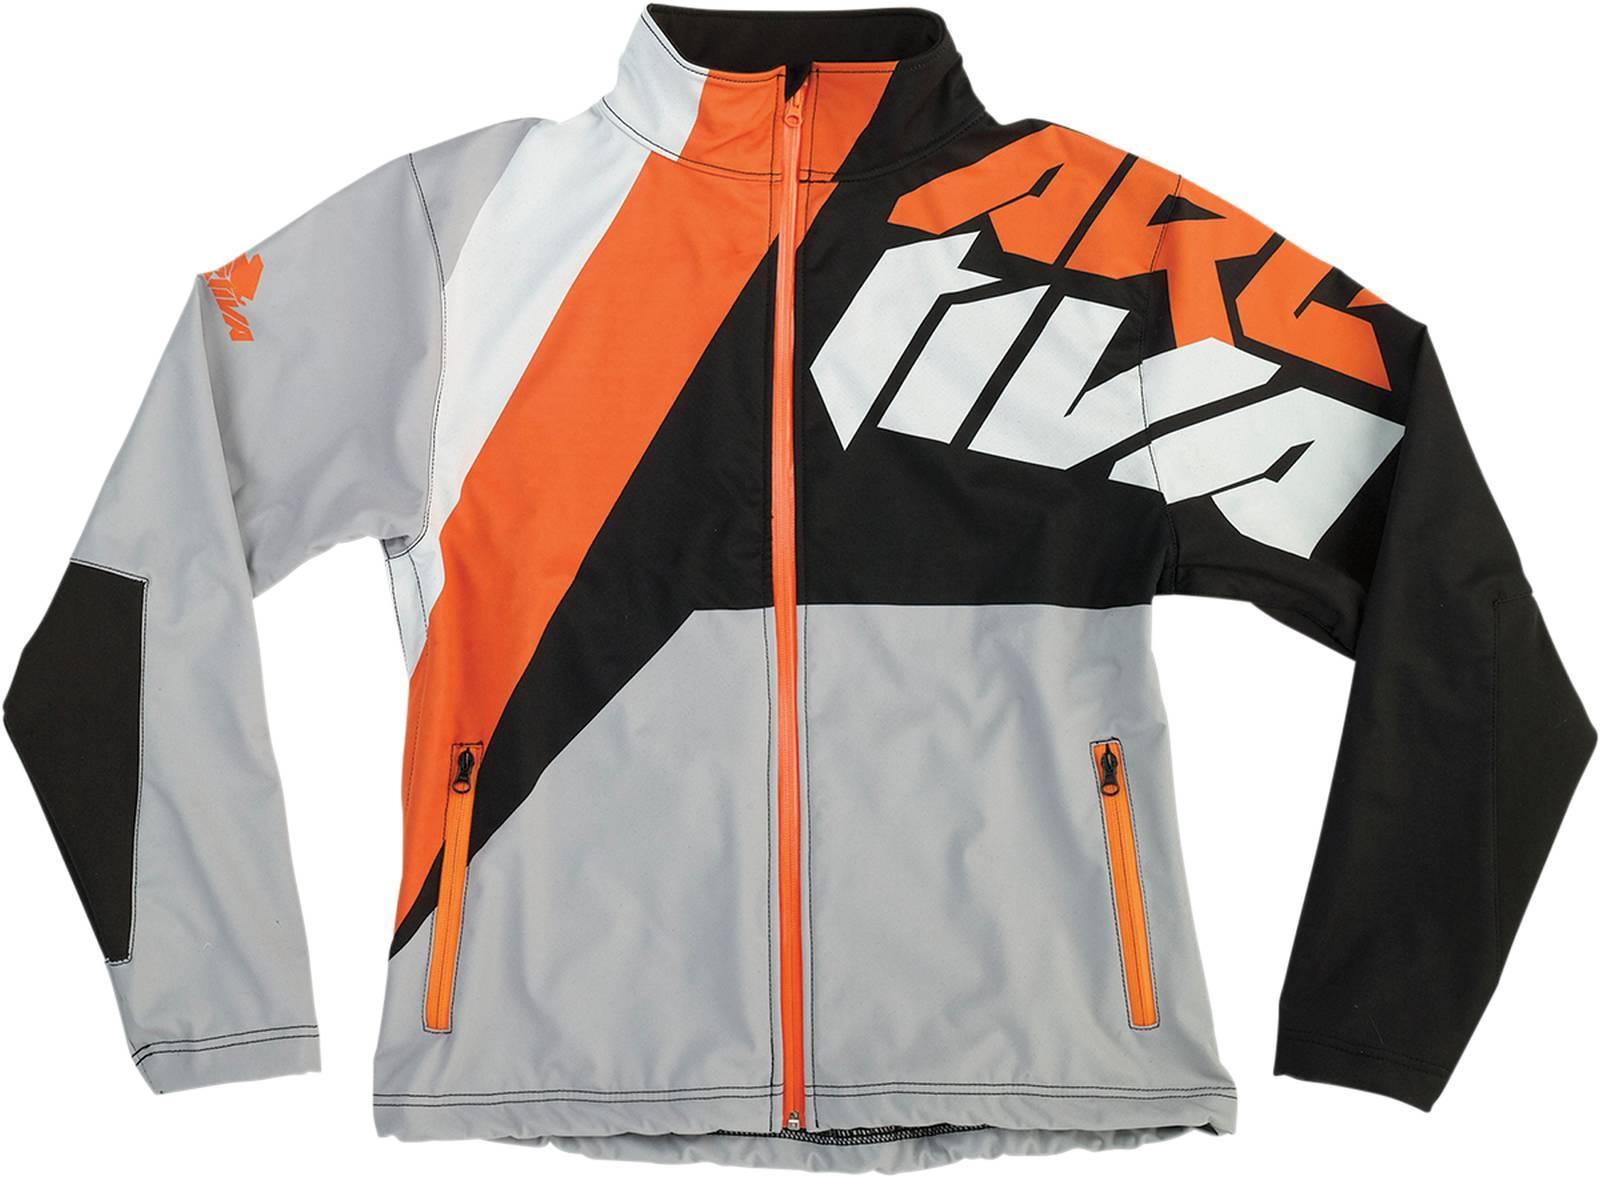 Arctiva Soft-Shell Windproof & Water-Resistant Jacket,Black/Gray/Orange,Small/SM